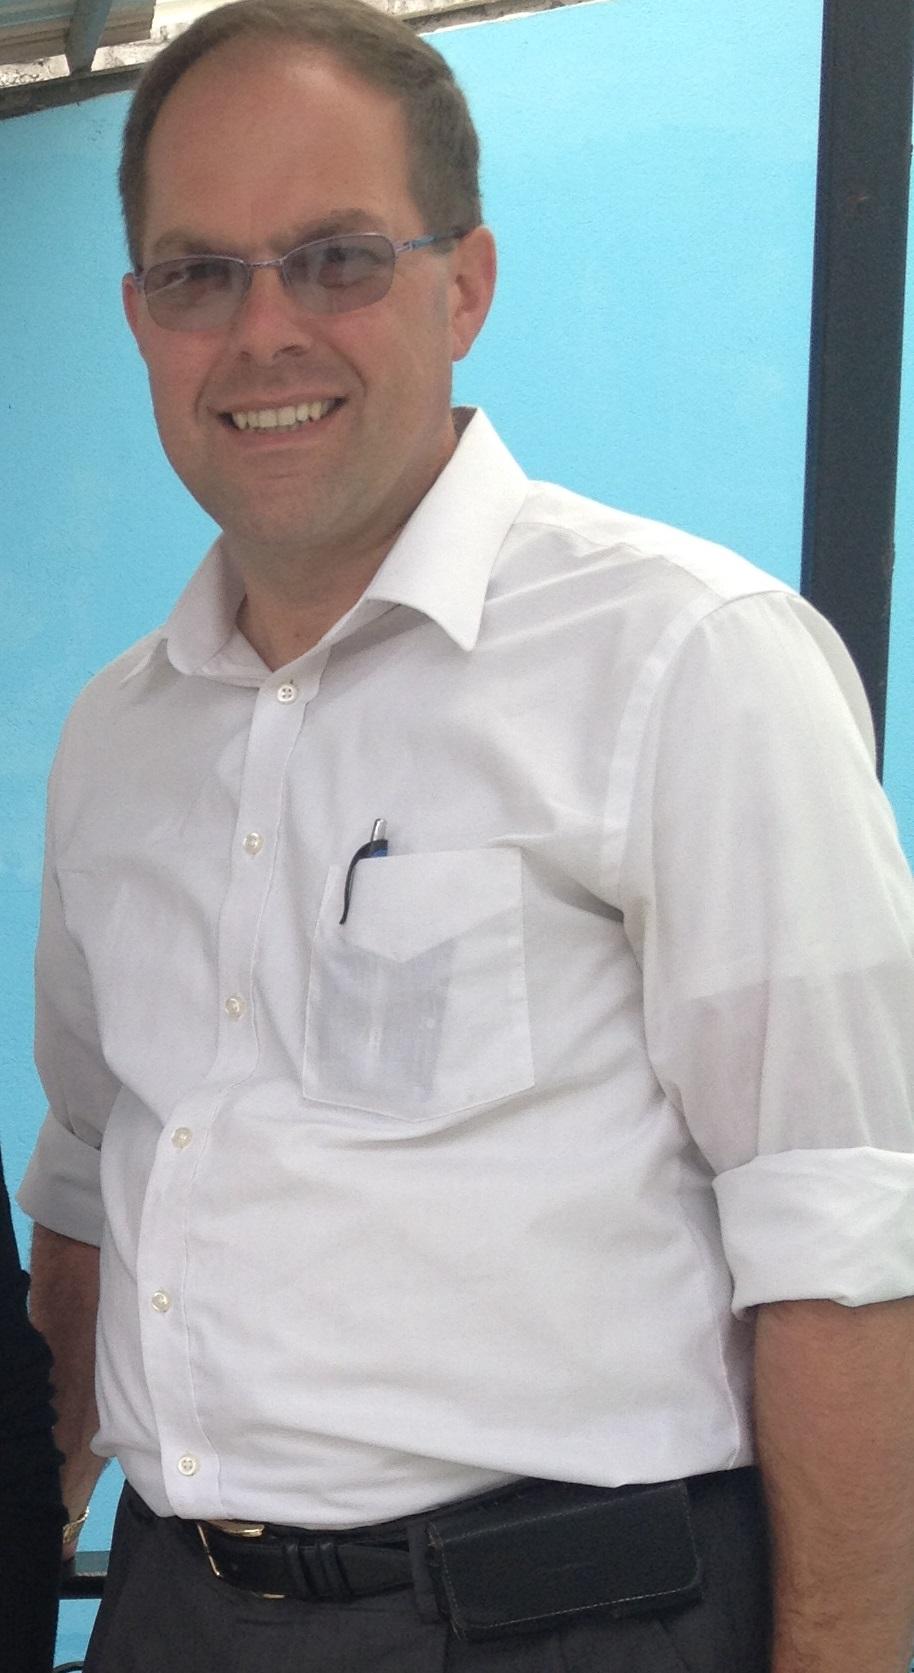 Non-Pink-Shirt